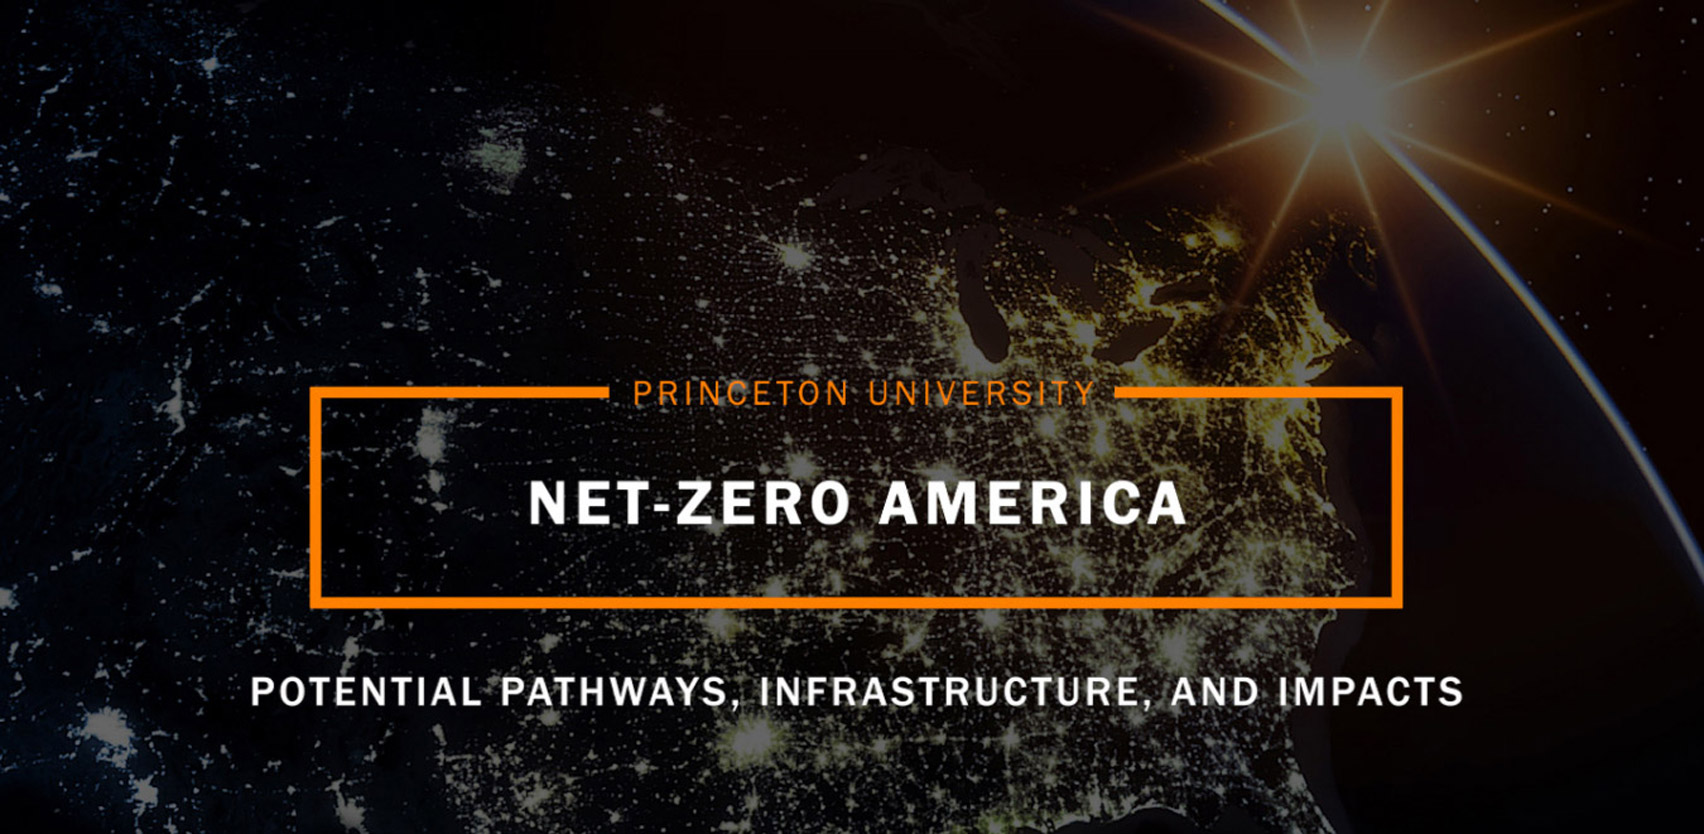 Net-zero America